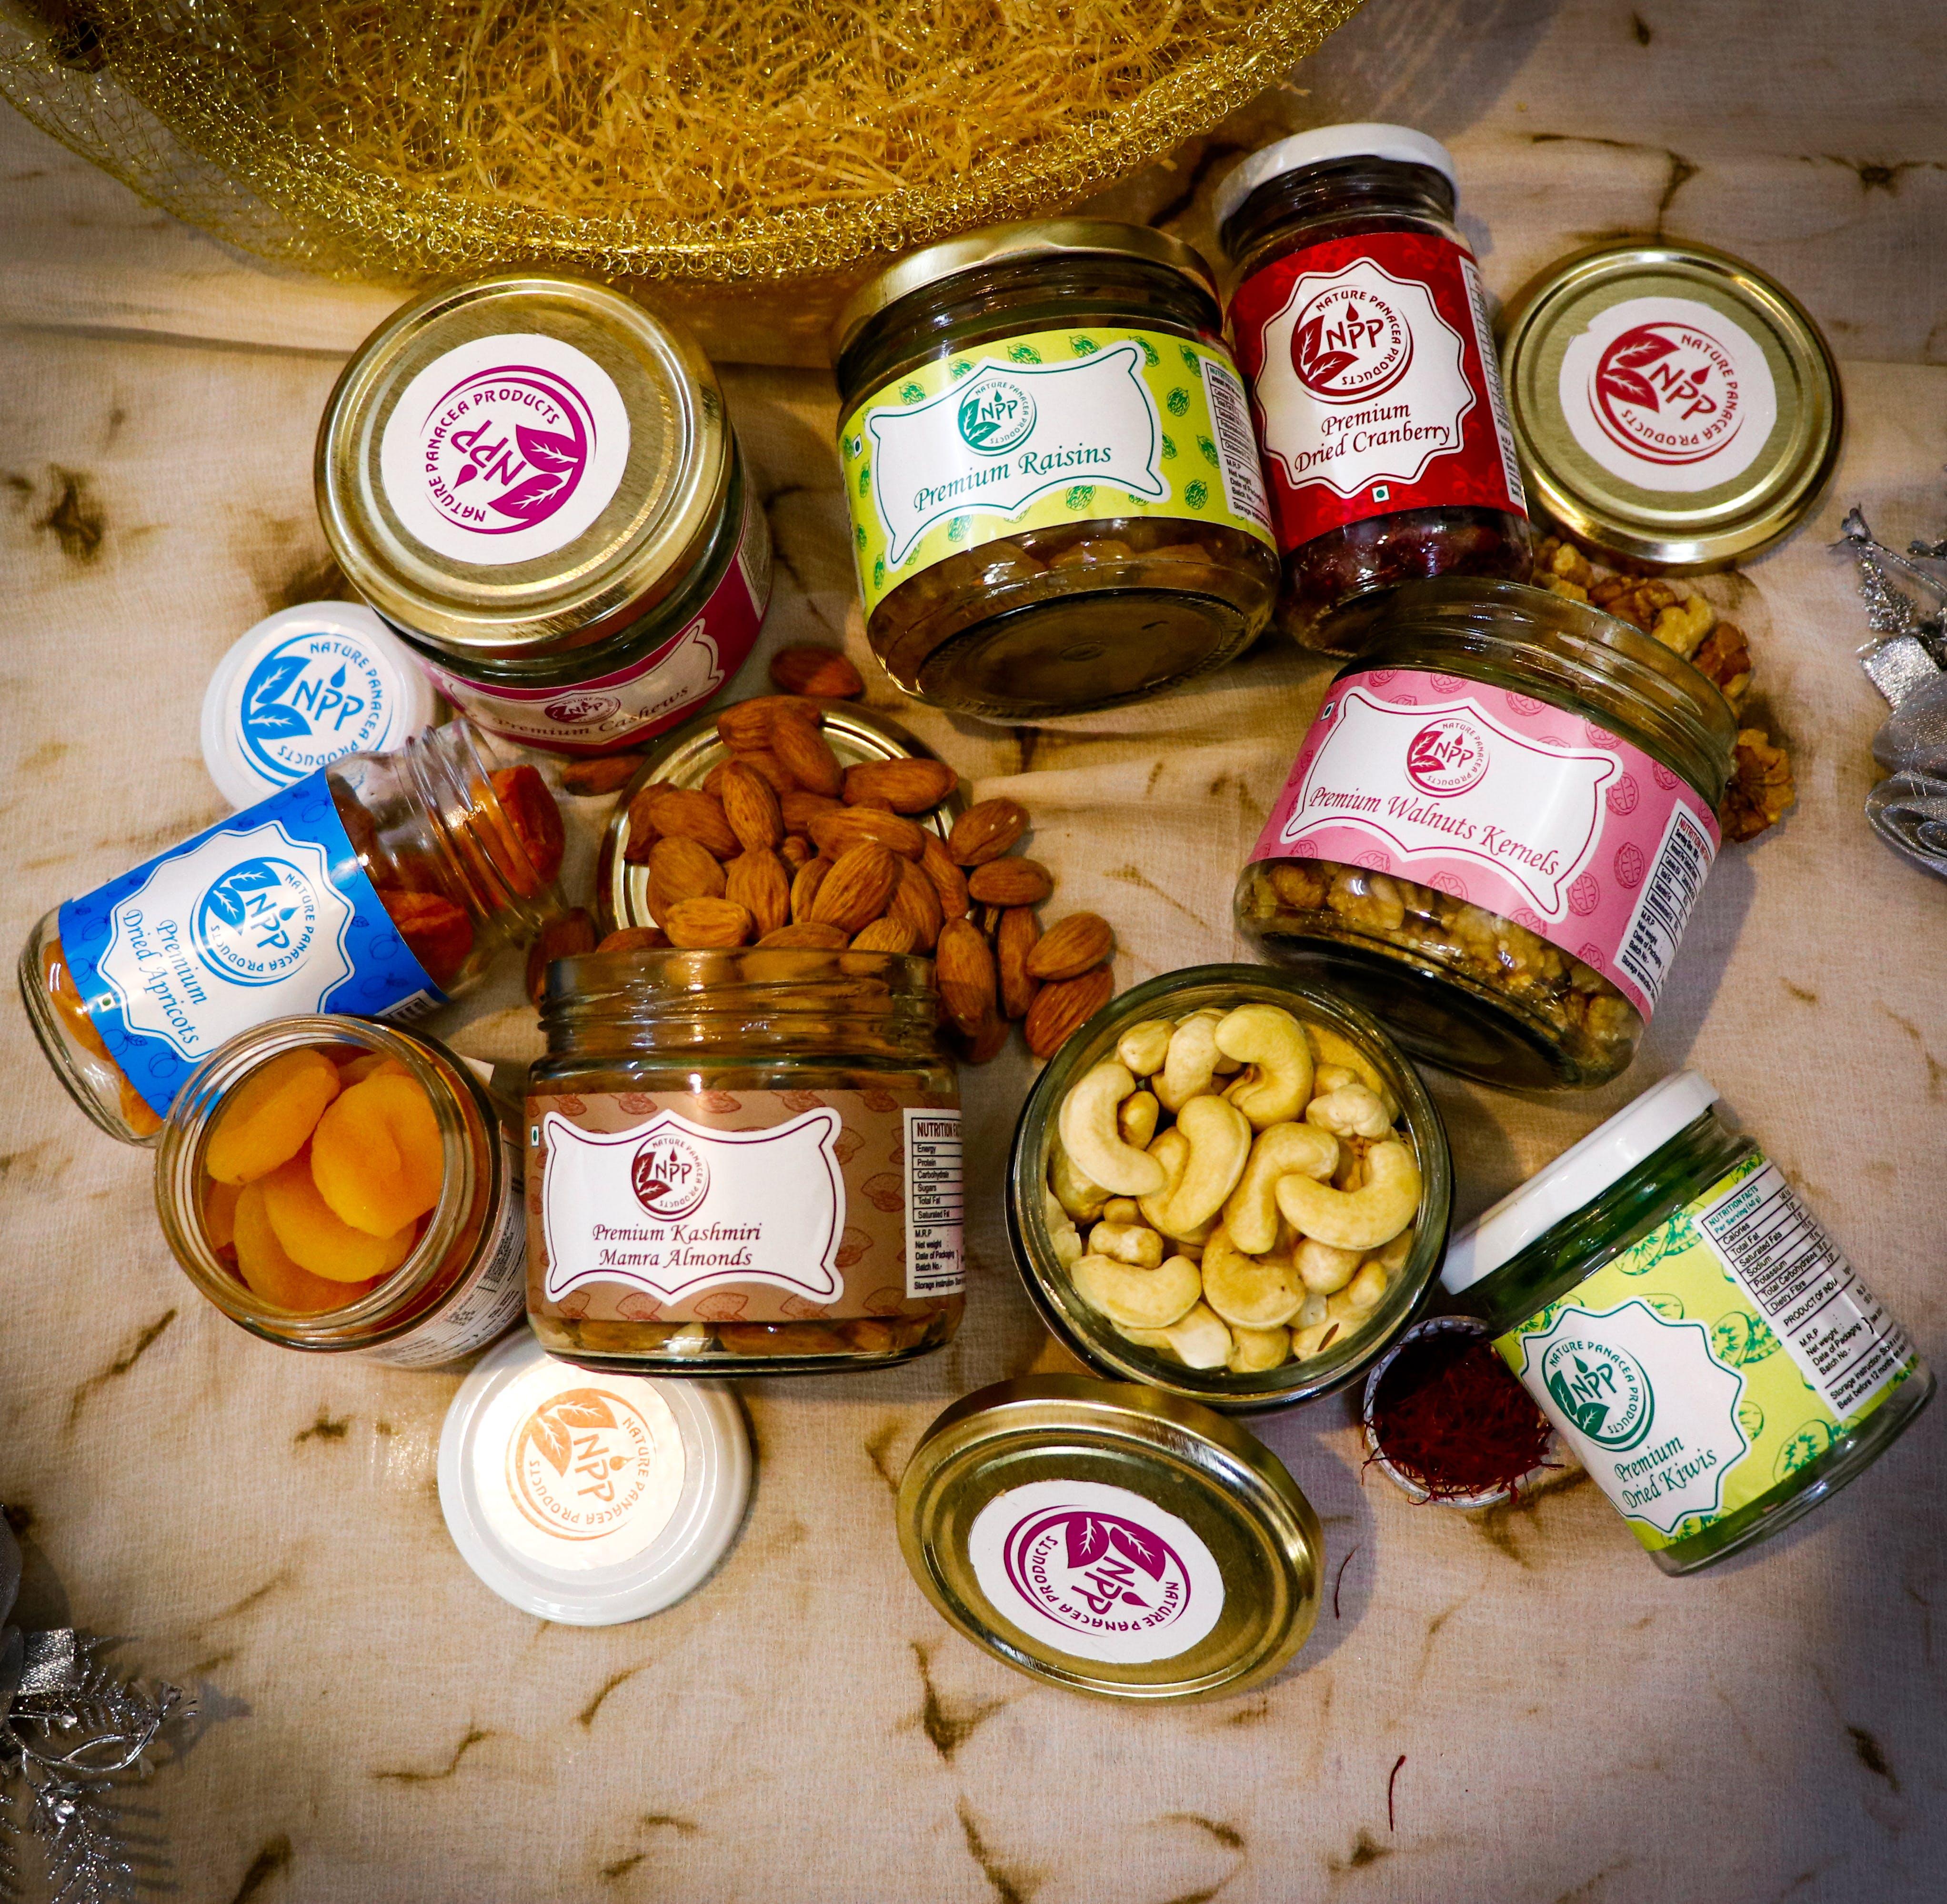 Food,Cuisine,Preserved food,Canning,Ingredient,Dish,Vegetarian food,Convenience food